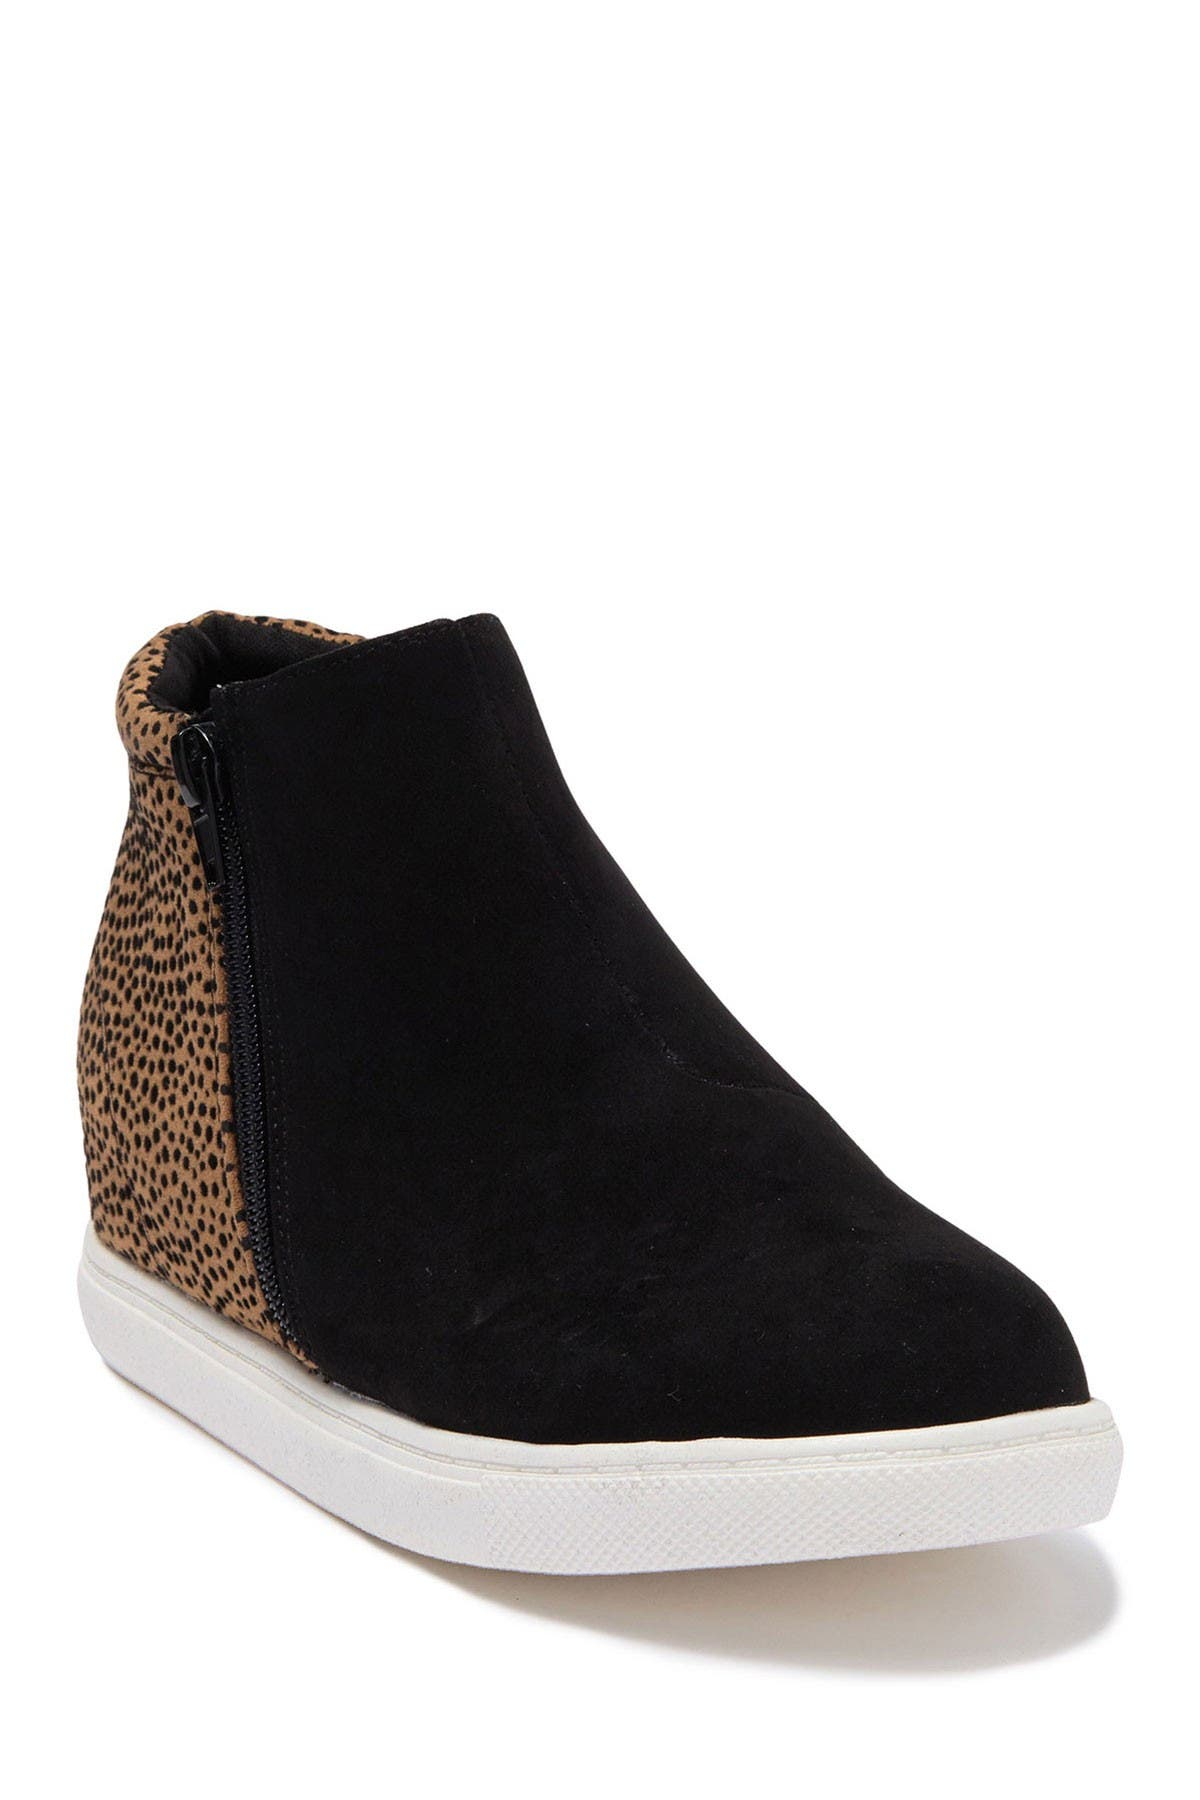 Image of Harper Canyon Winnie Wedge Sneaker